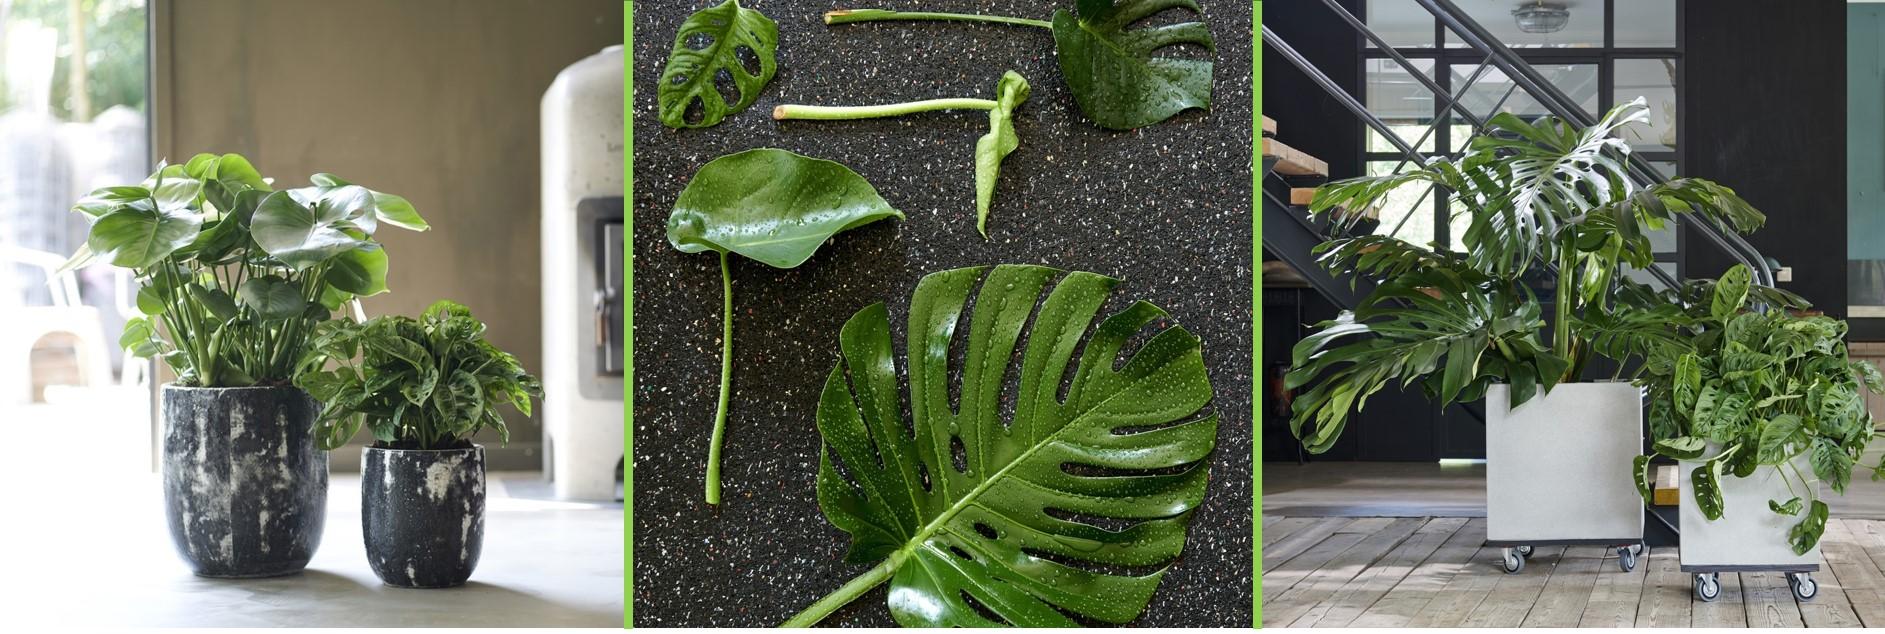 A chaque mois sa plante, juillet : le Monstera